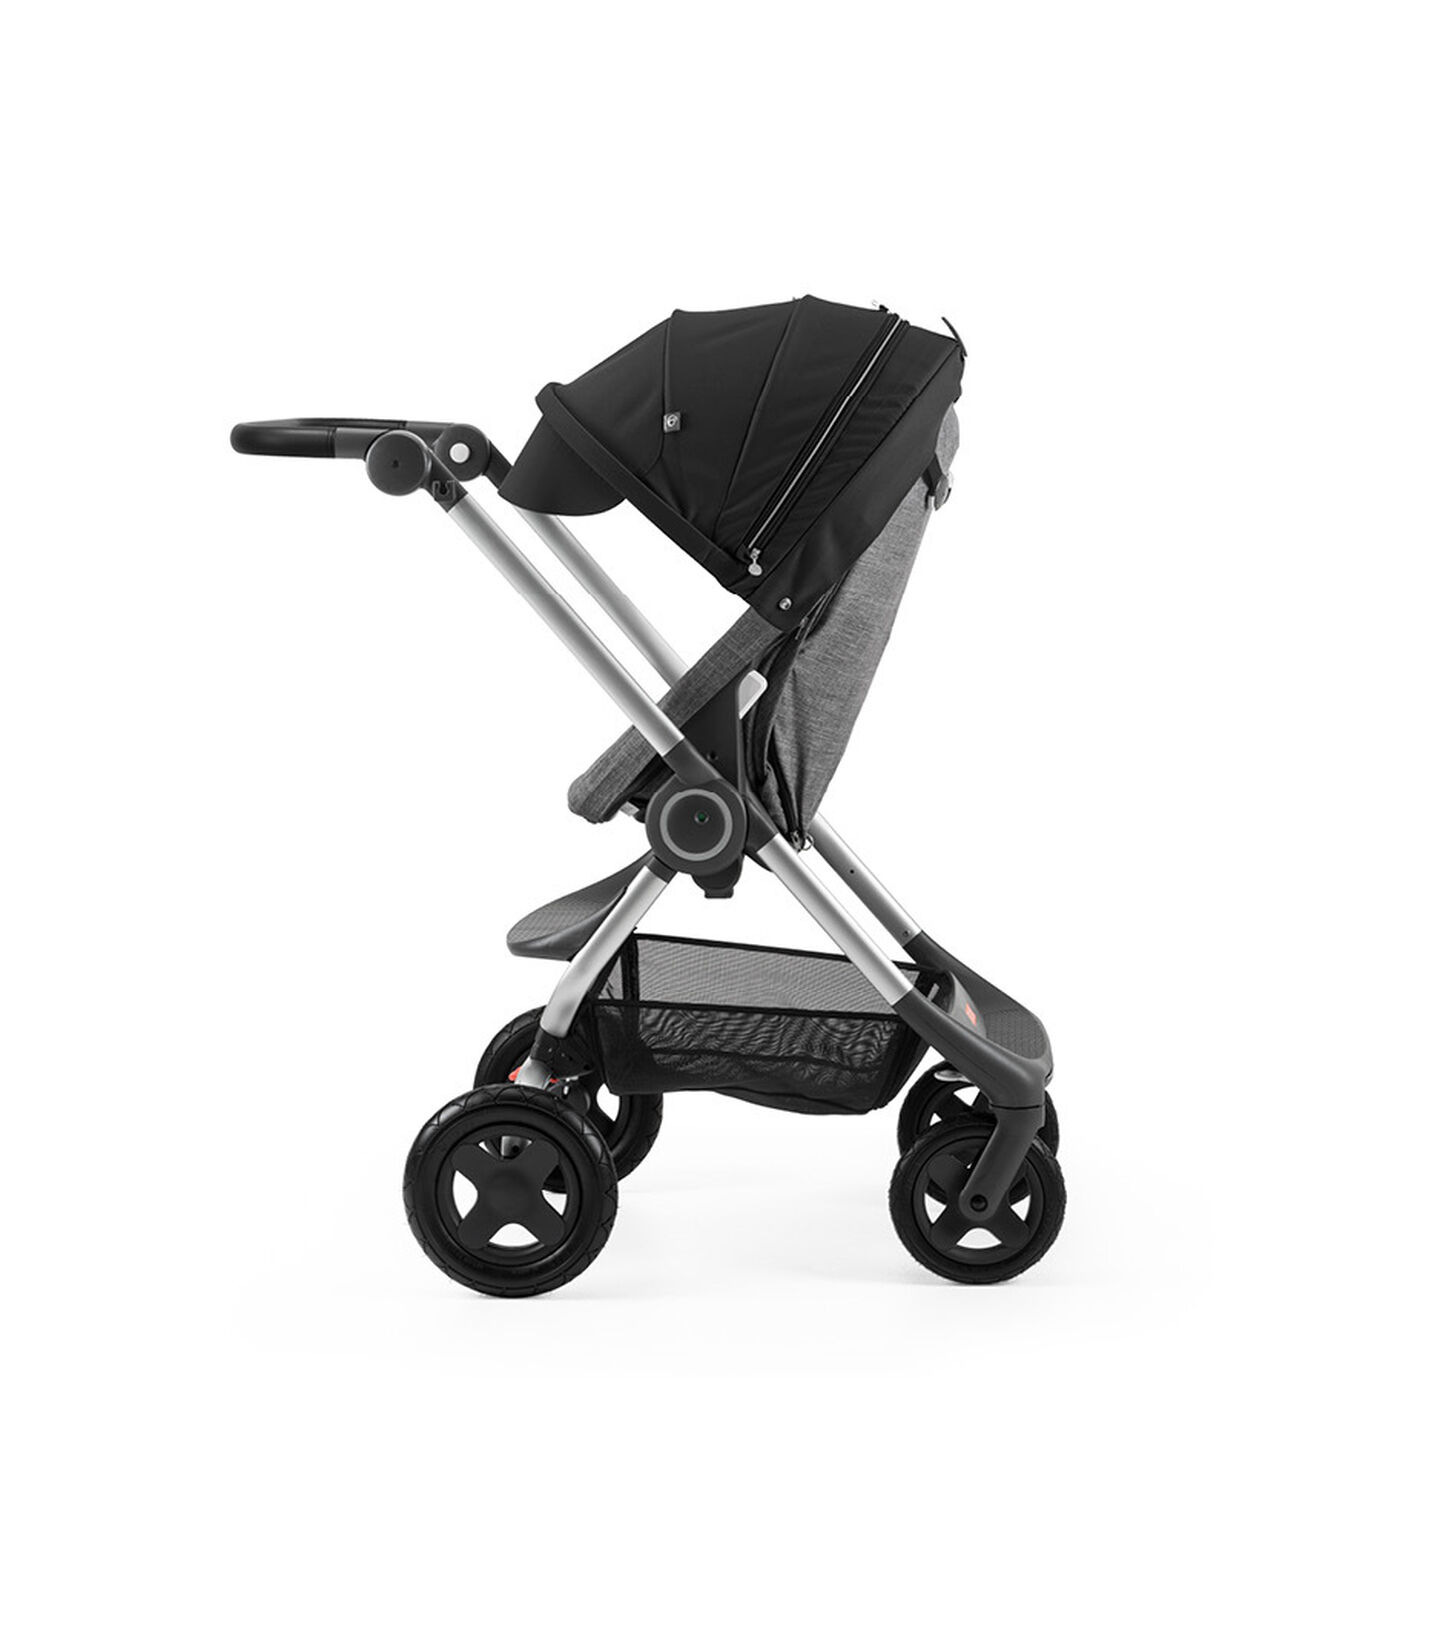 Stokke® Scoot™ Black Melange  with Black Canopy. Parent facing, active position.